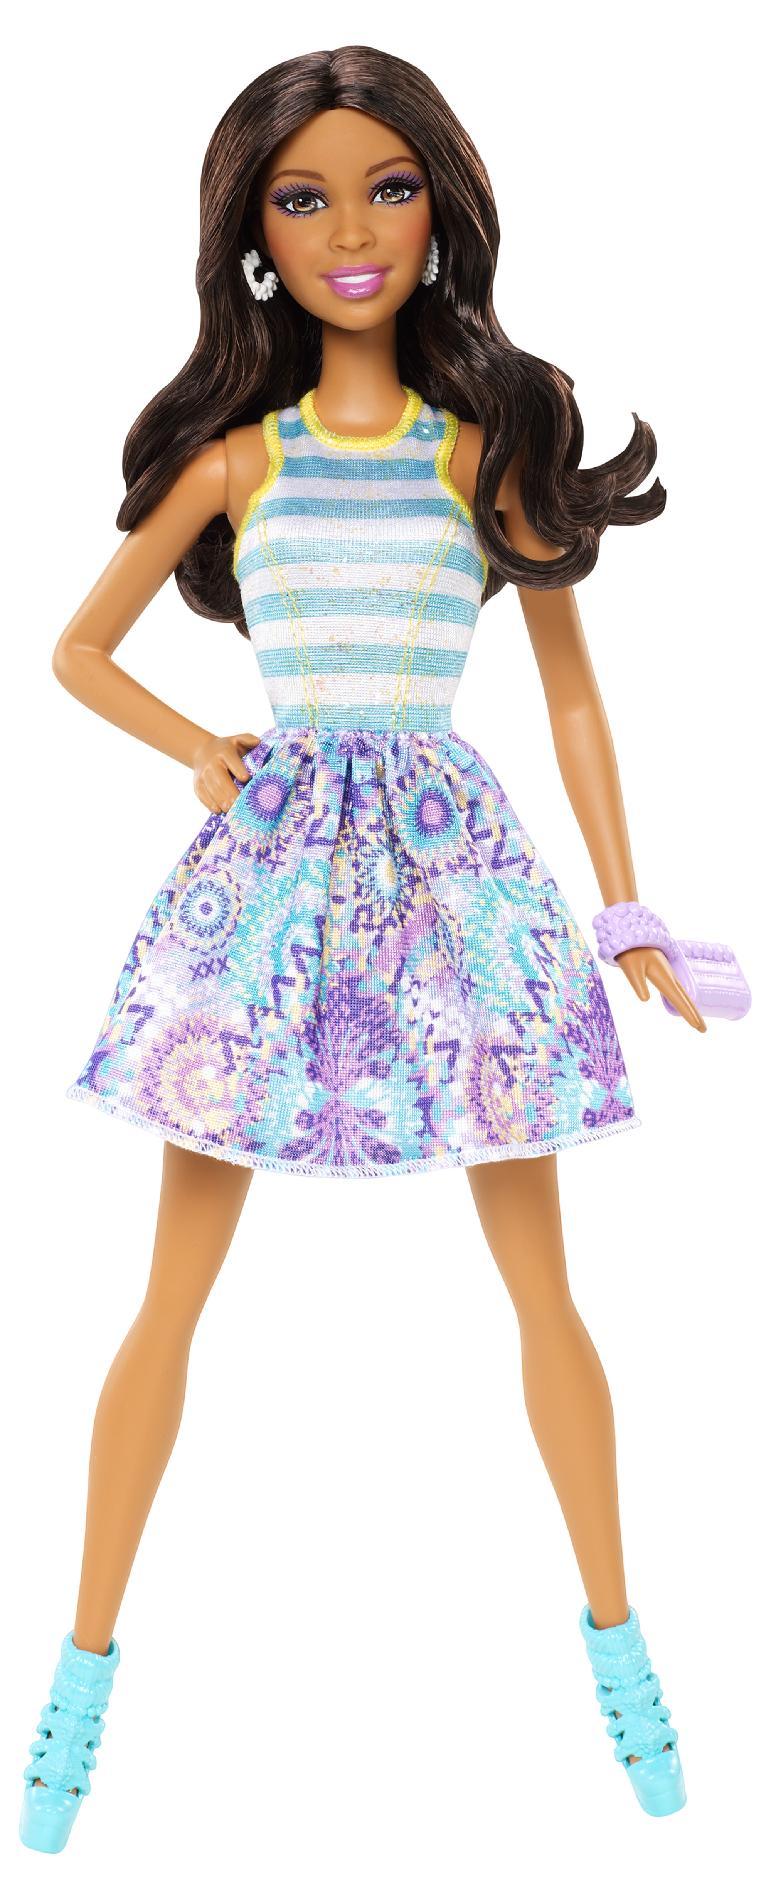 Barbie Fashionista Nikki Doll By Mattel Toys Amp Games